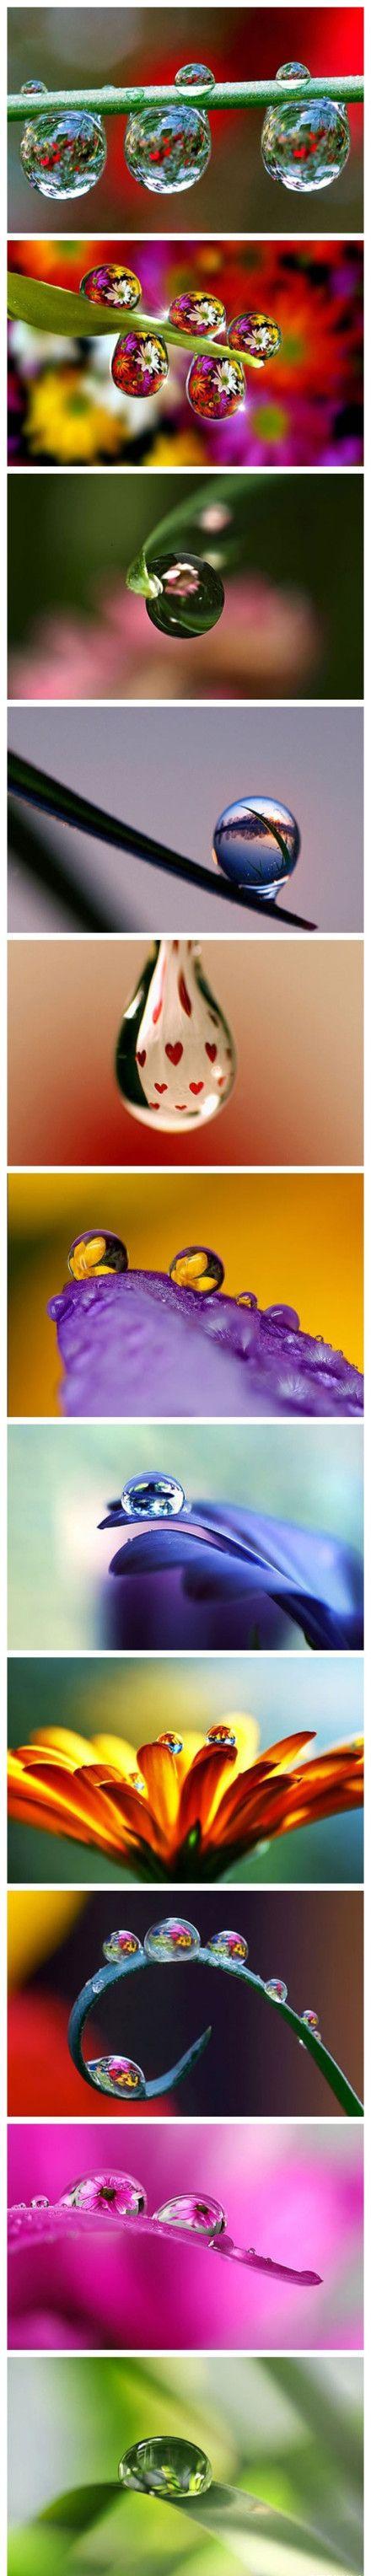 amazing drops